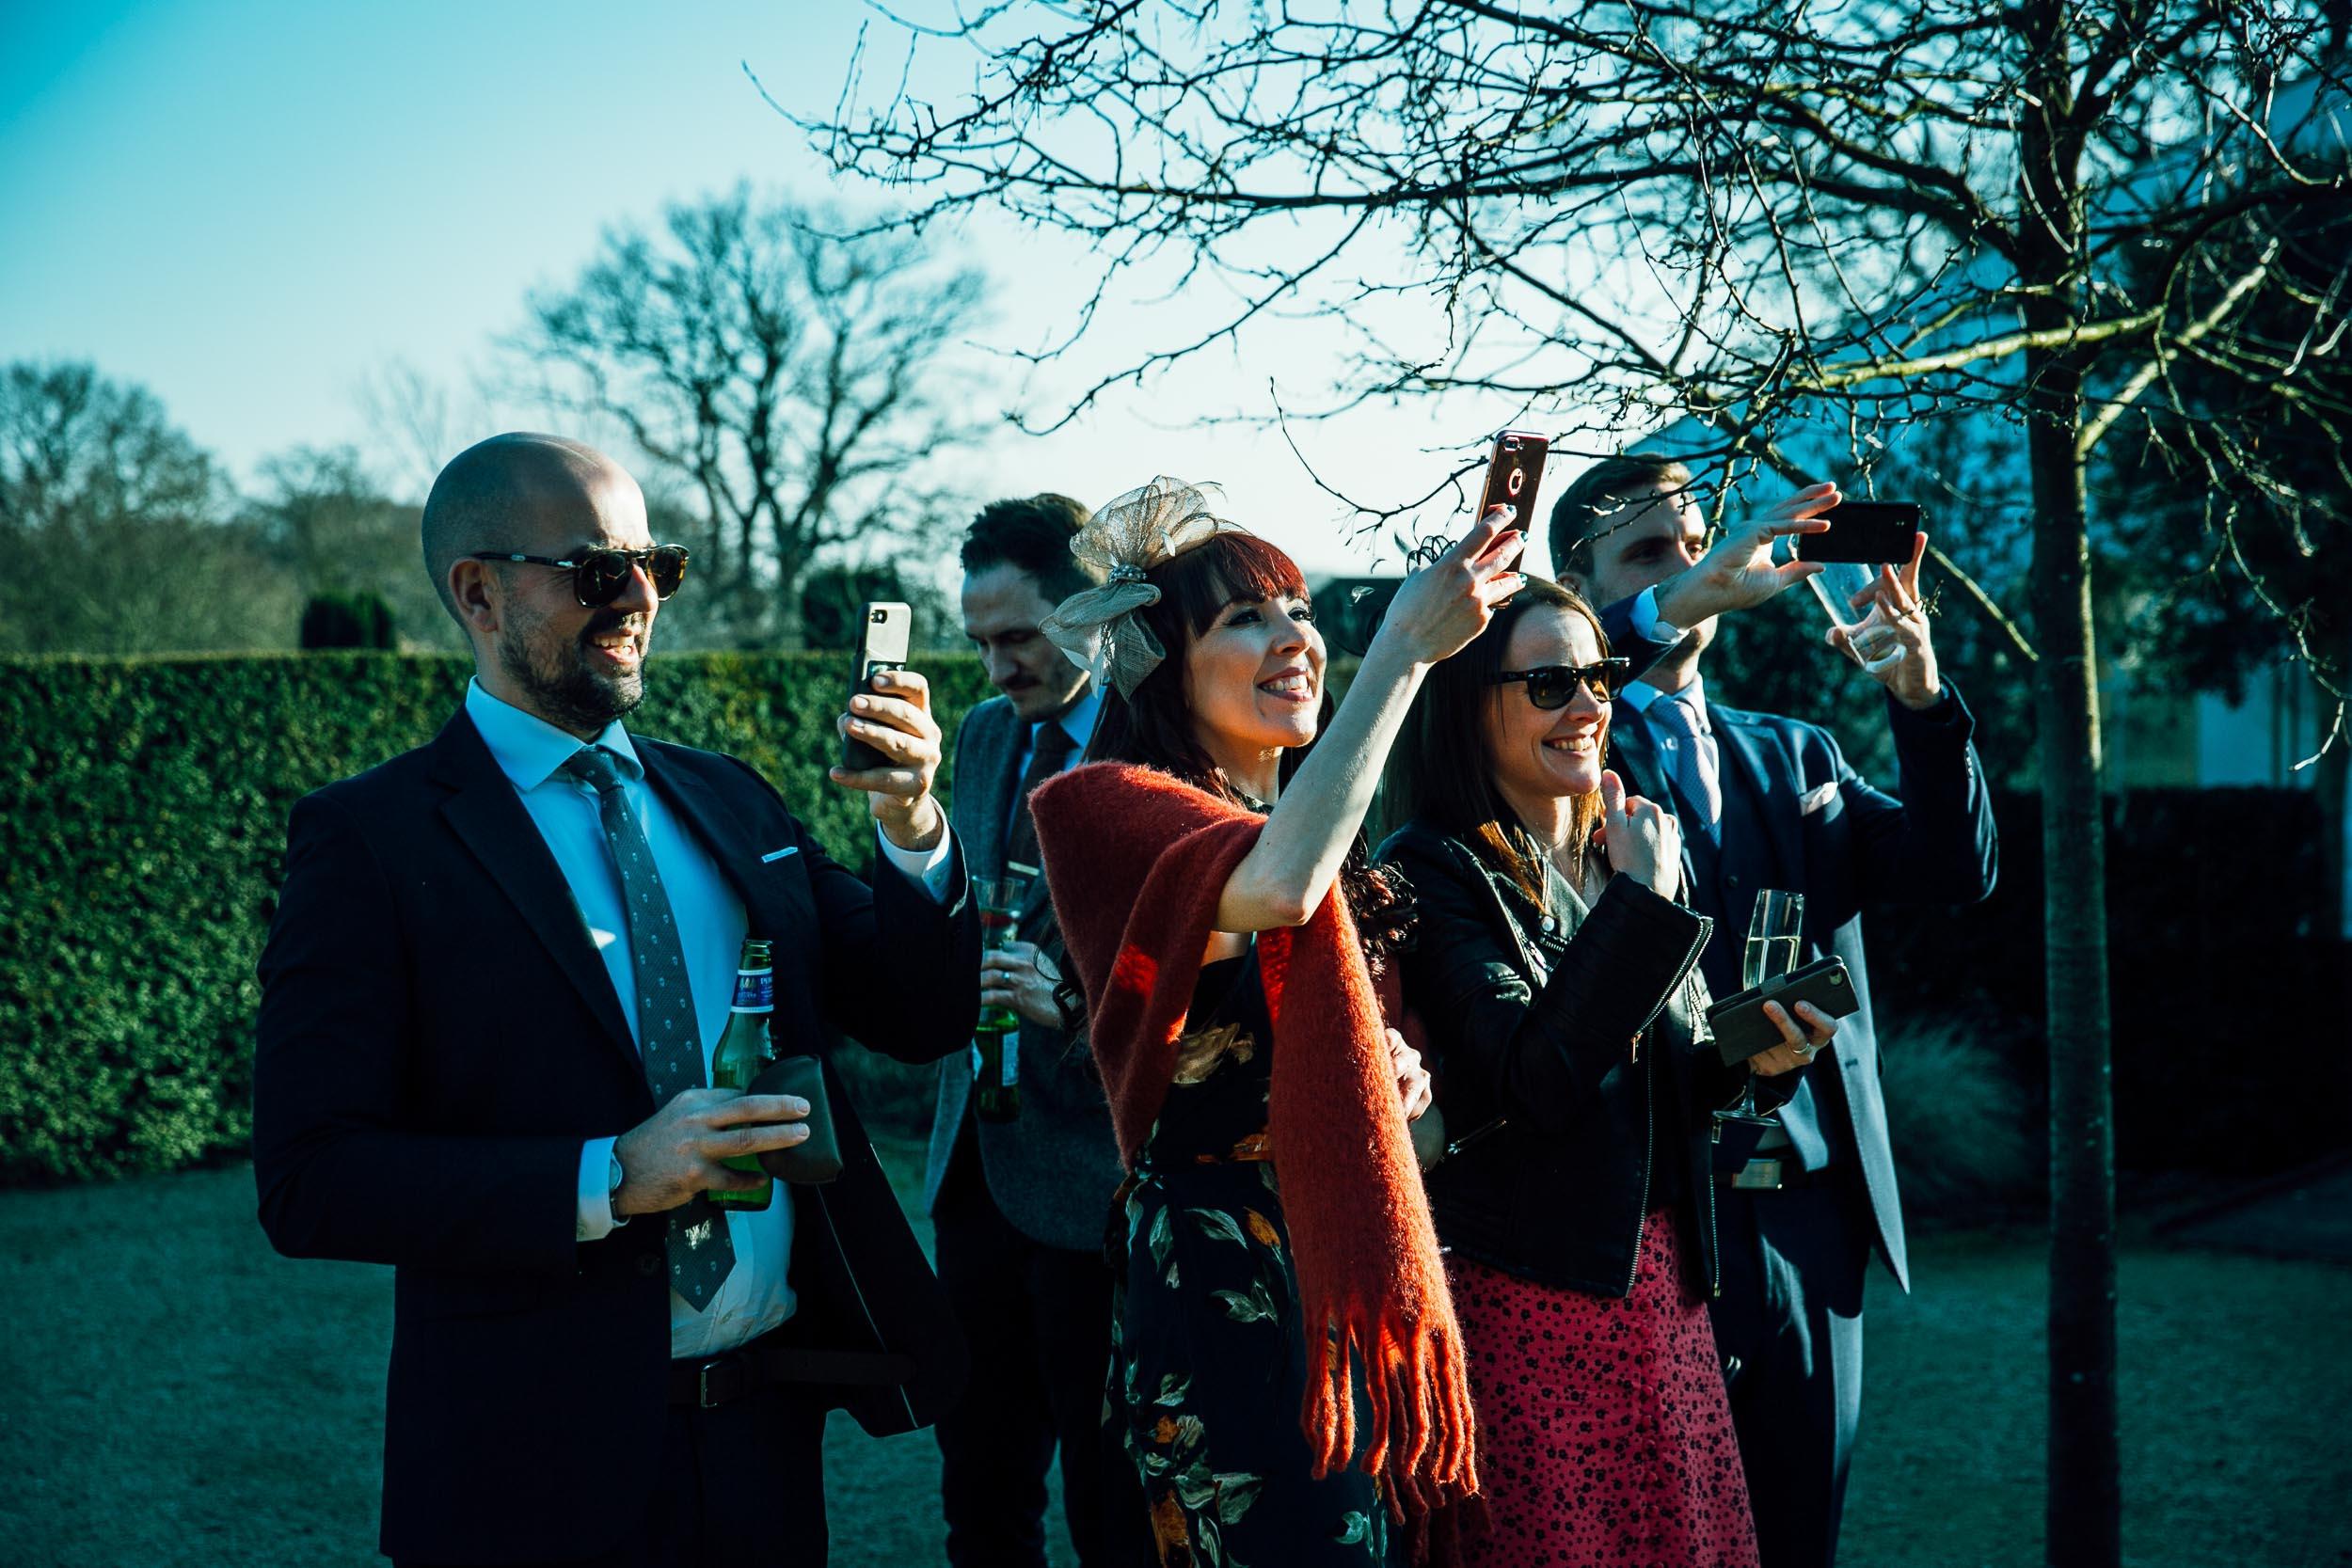 micklefield-hall-wedding-photographer 060.jpg